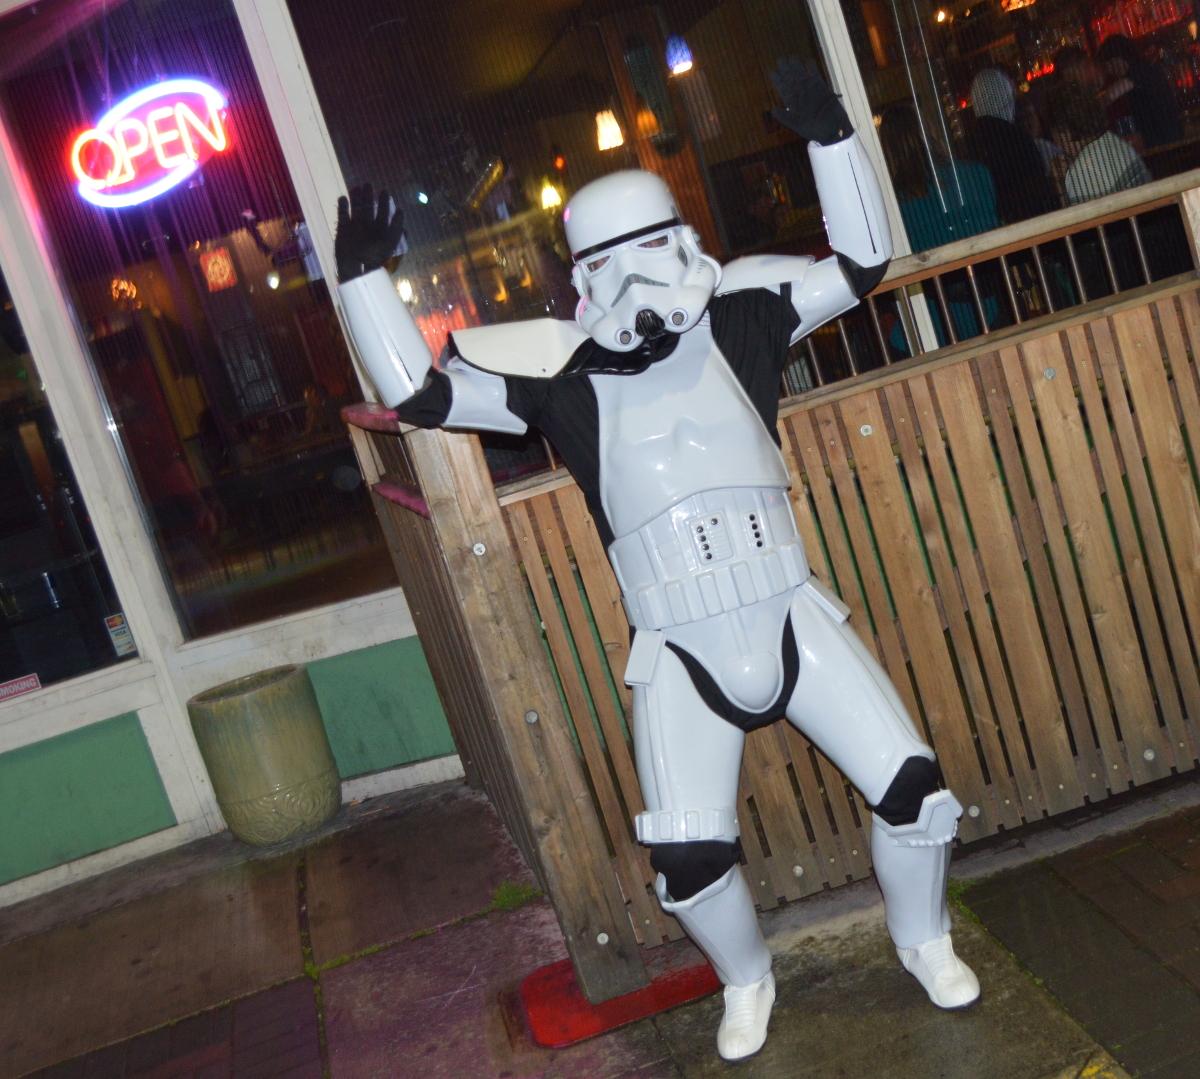 stormtrooper1.jpeg